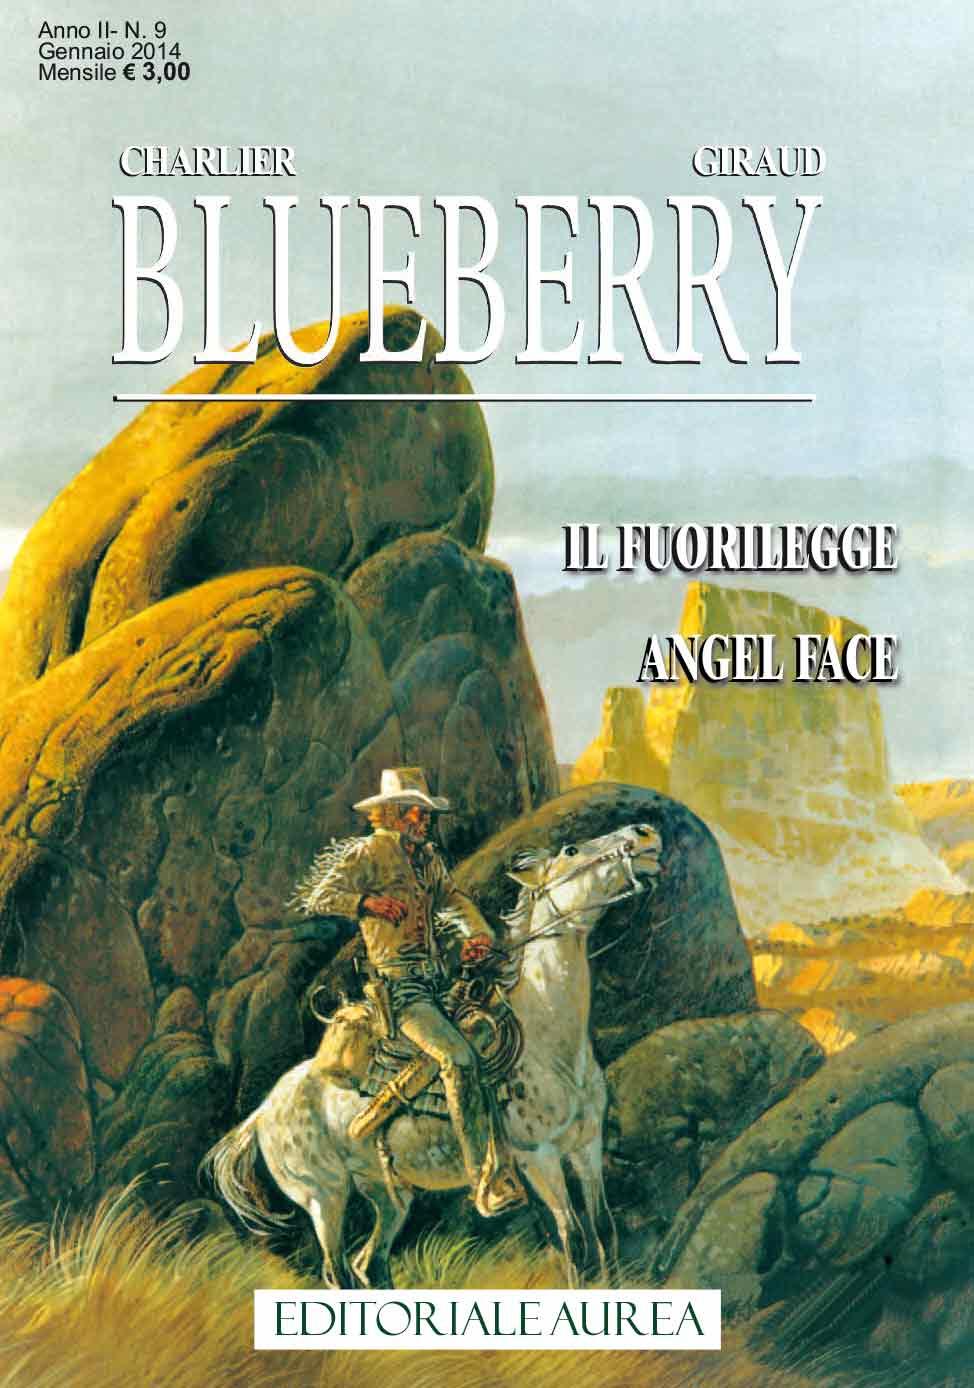 Blueberry (2013) Vol 1 9